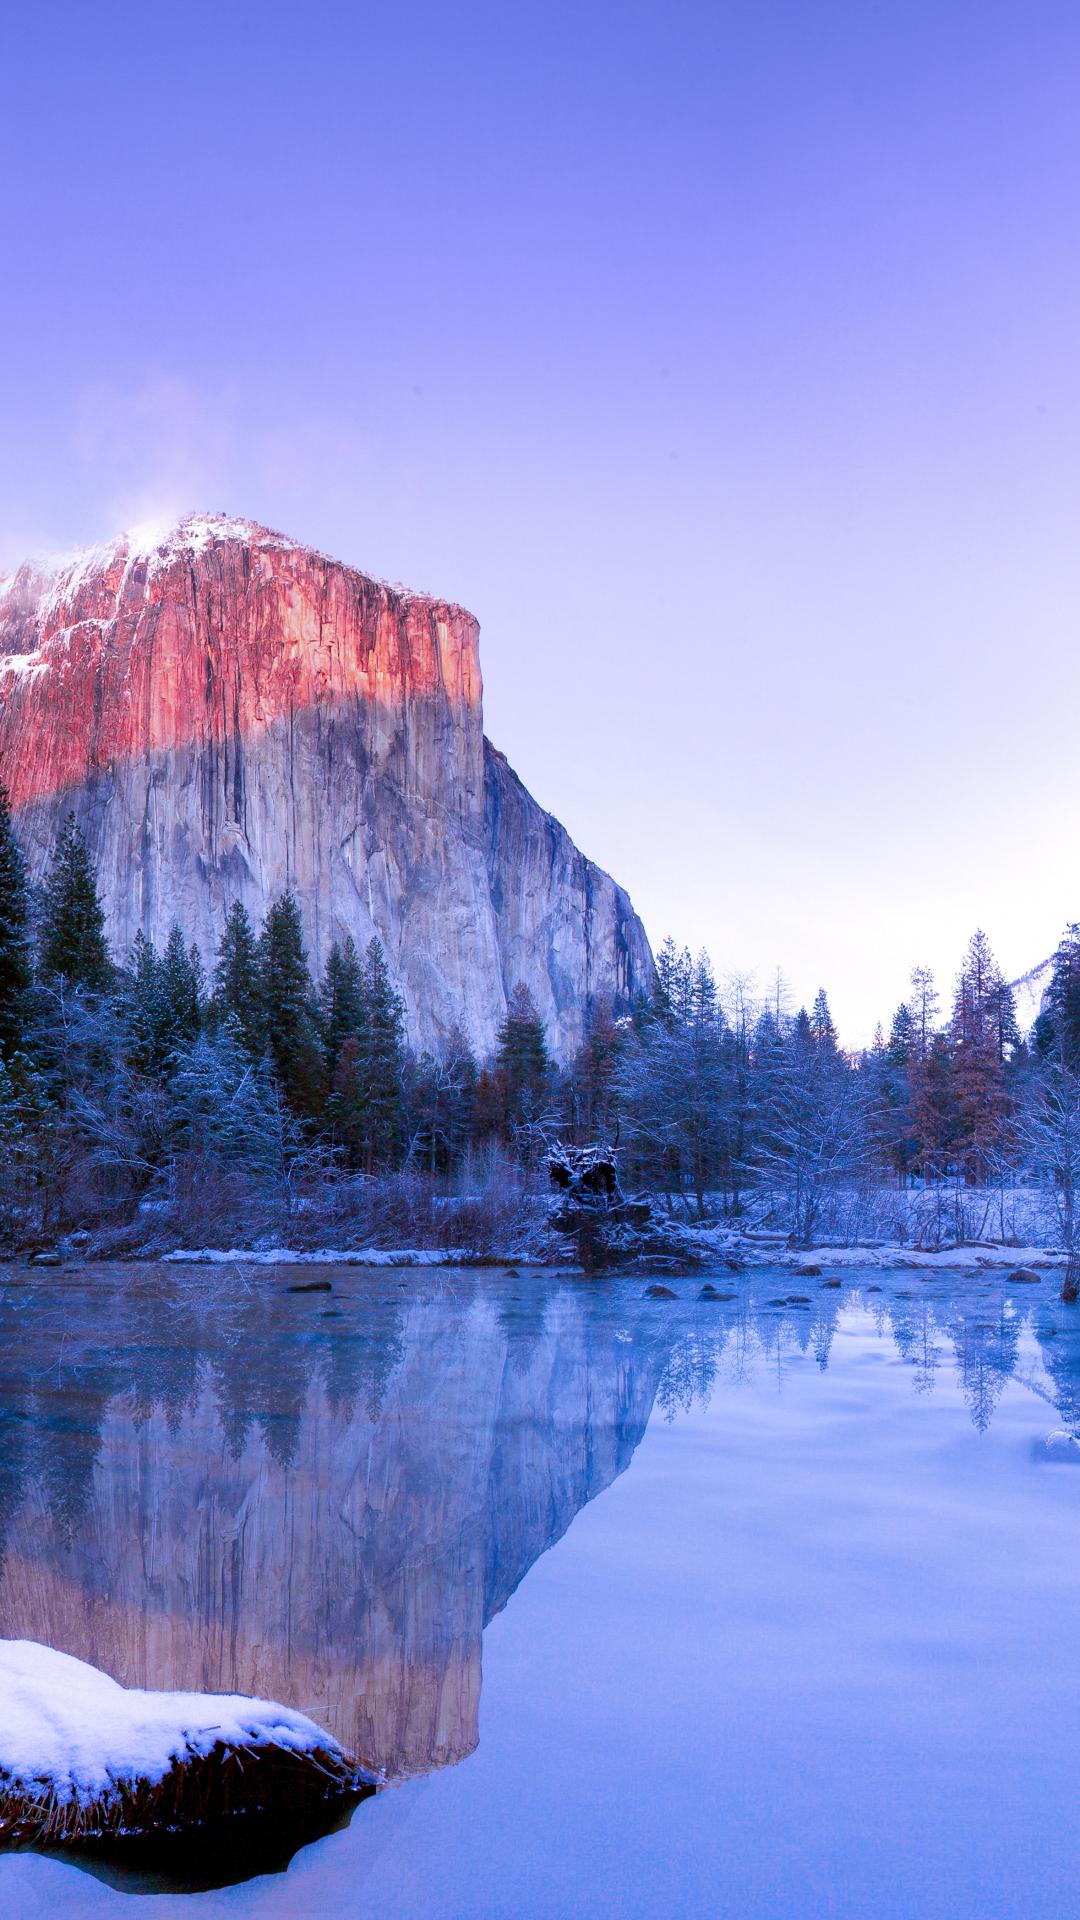 Yosemite Lake Iphone Wallpaper Idrop News